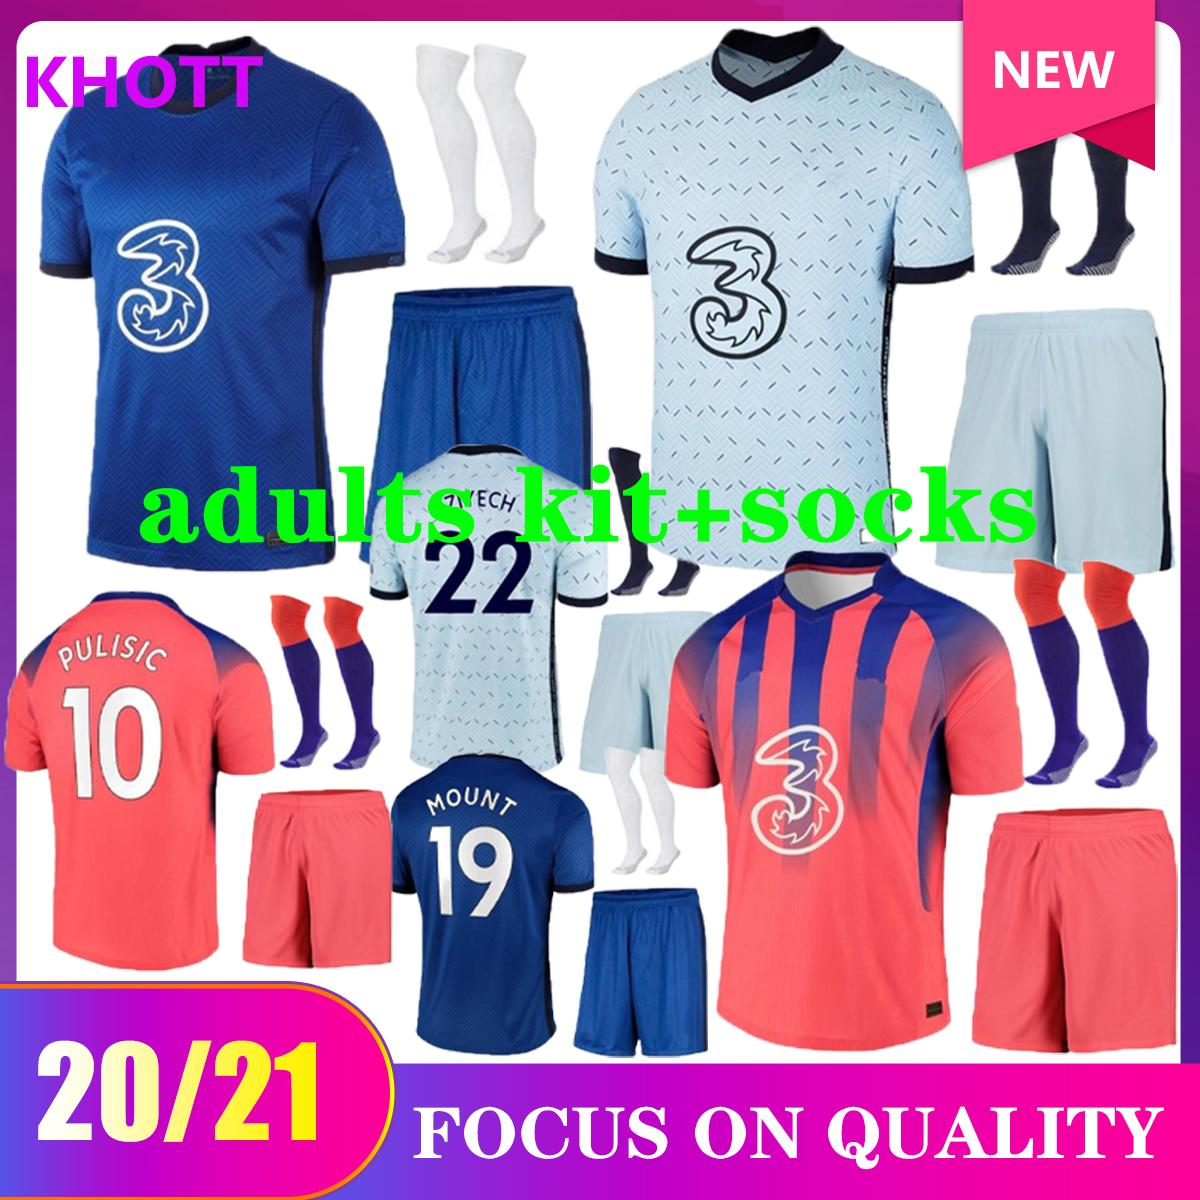 20 21 21 CFC Soccer Jerseys Chilwell Werner Ziyech T.SILVA Kovacic Kante Willian Mount Football Camicia da calcio 2020 2021 Abraham Home Away Jersey Kit